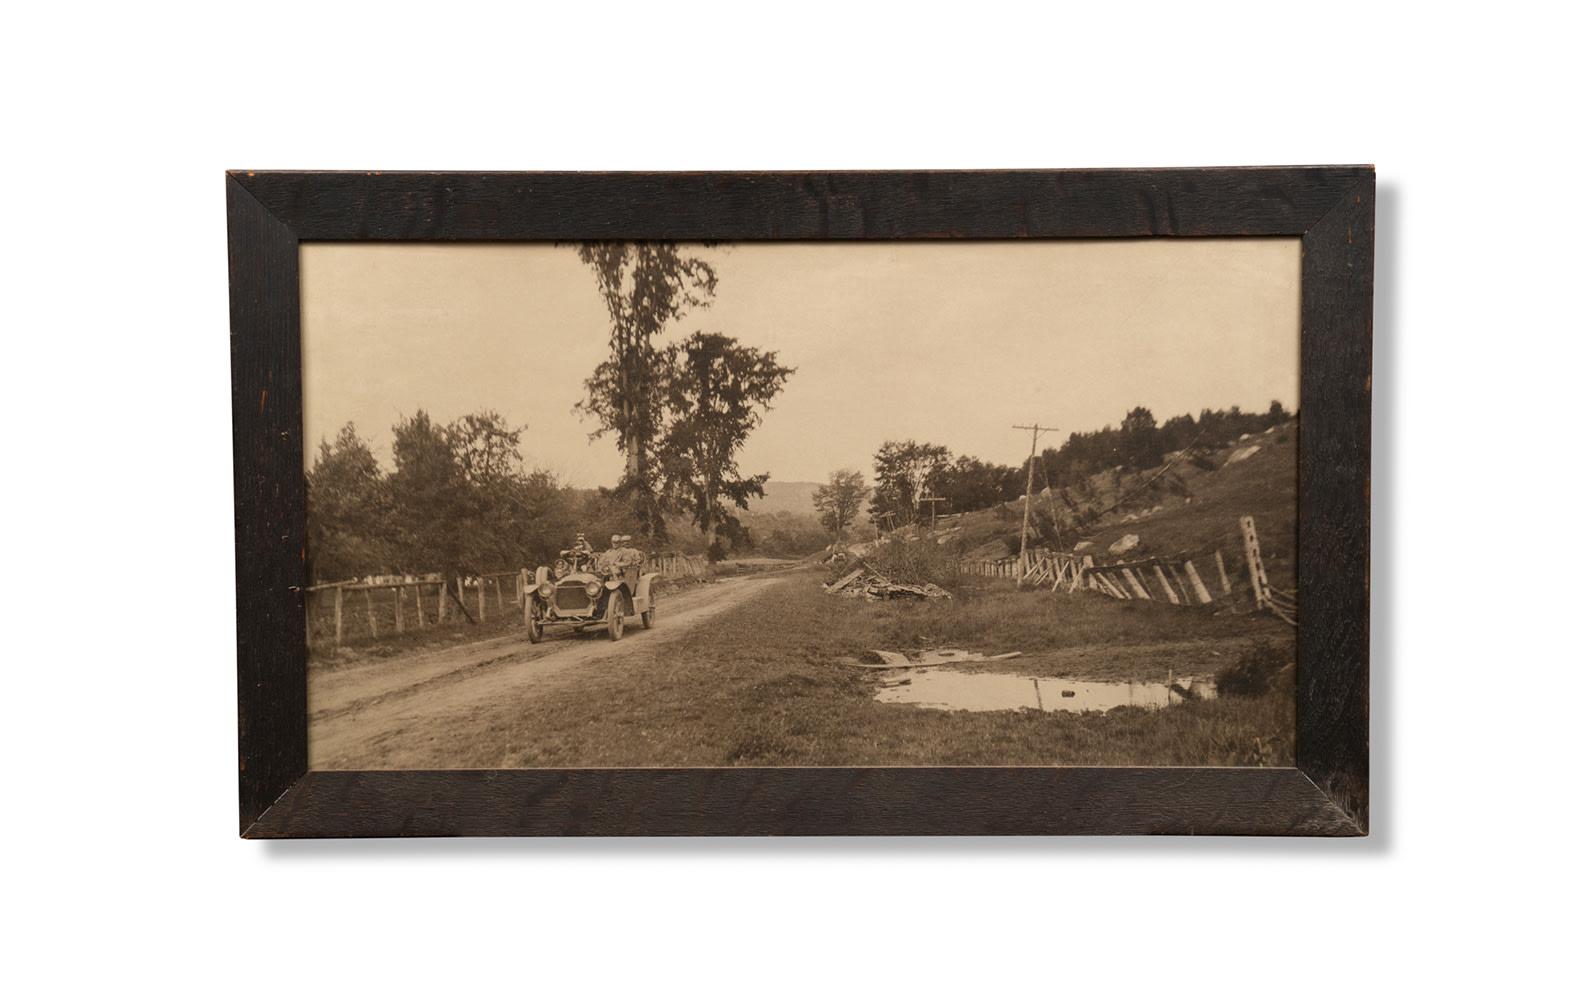 Period Photograph of a Packard on the Glidden Tour, Framed